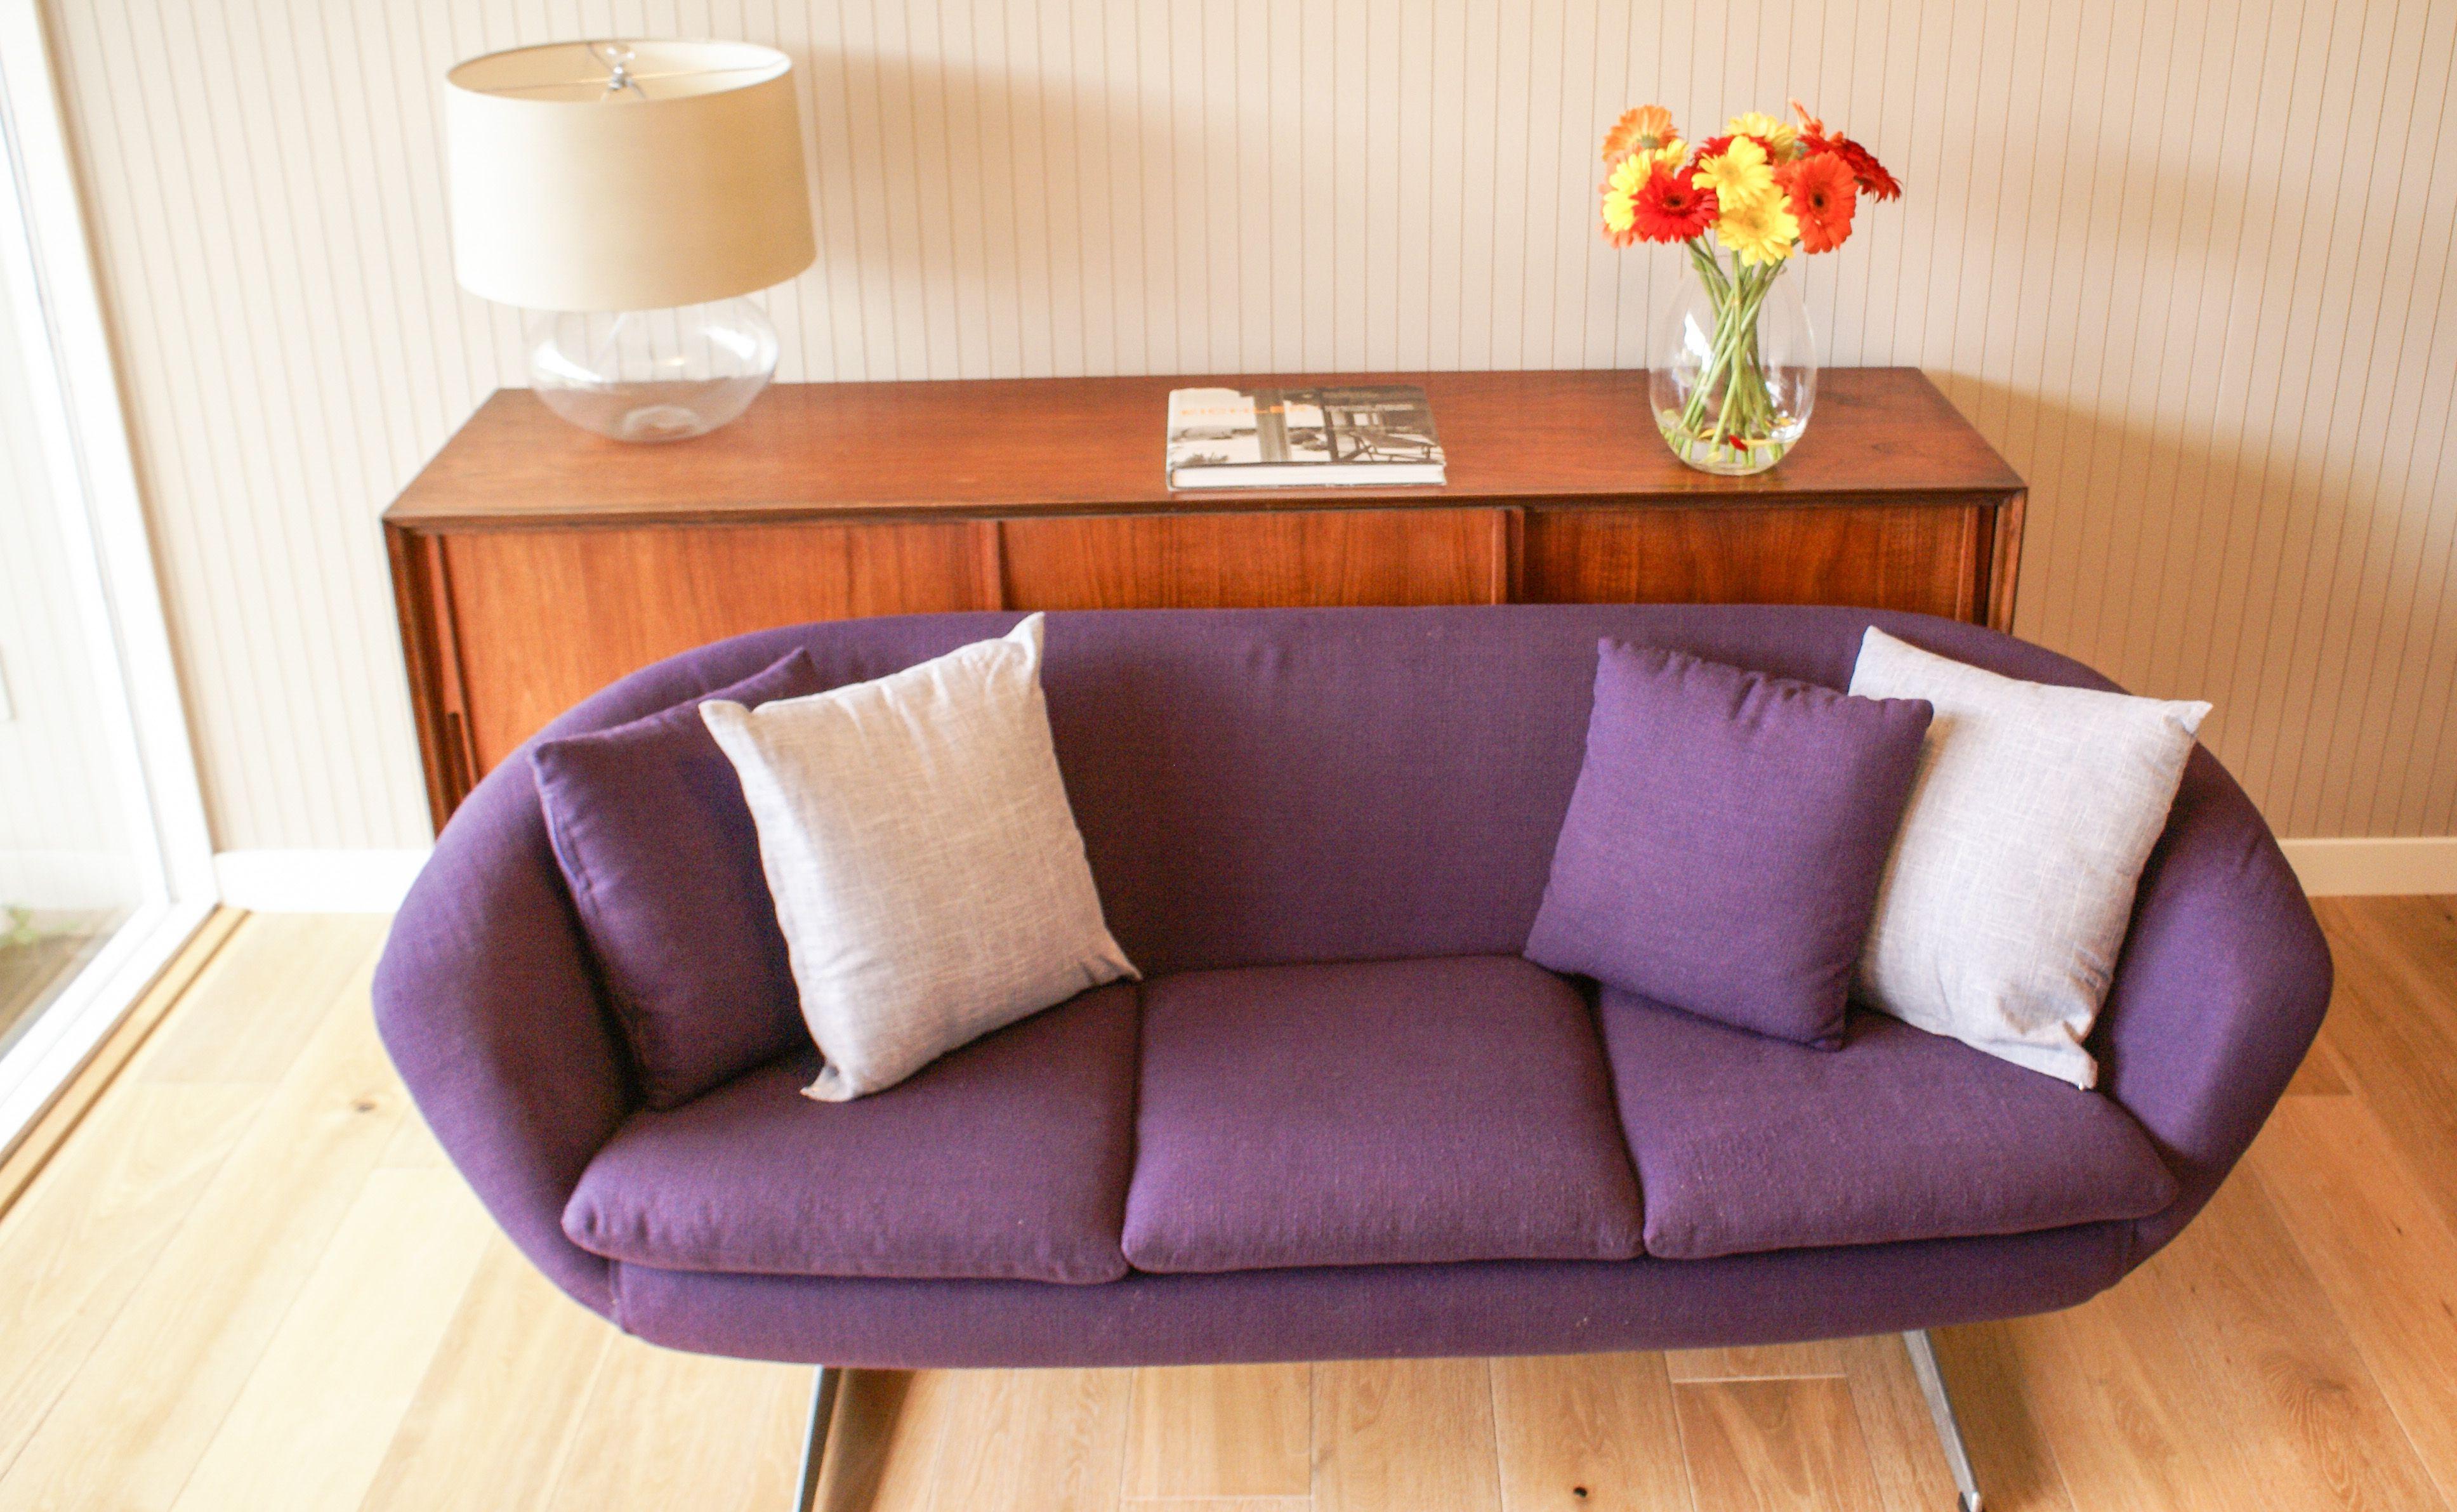 Wunderbar Mitte Des Jahrhunderts Modernes Sofa, Polyvore